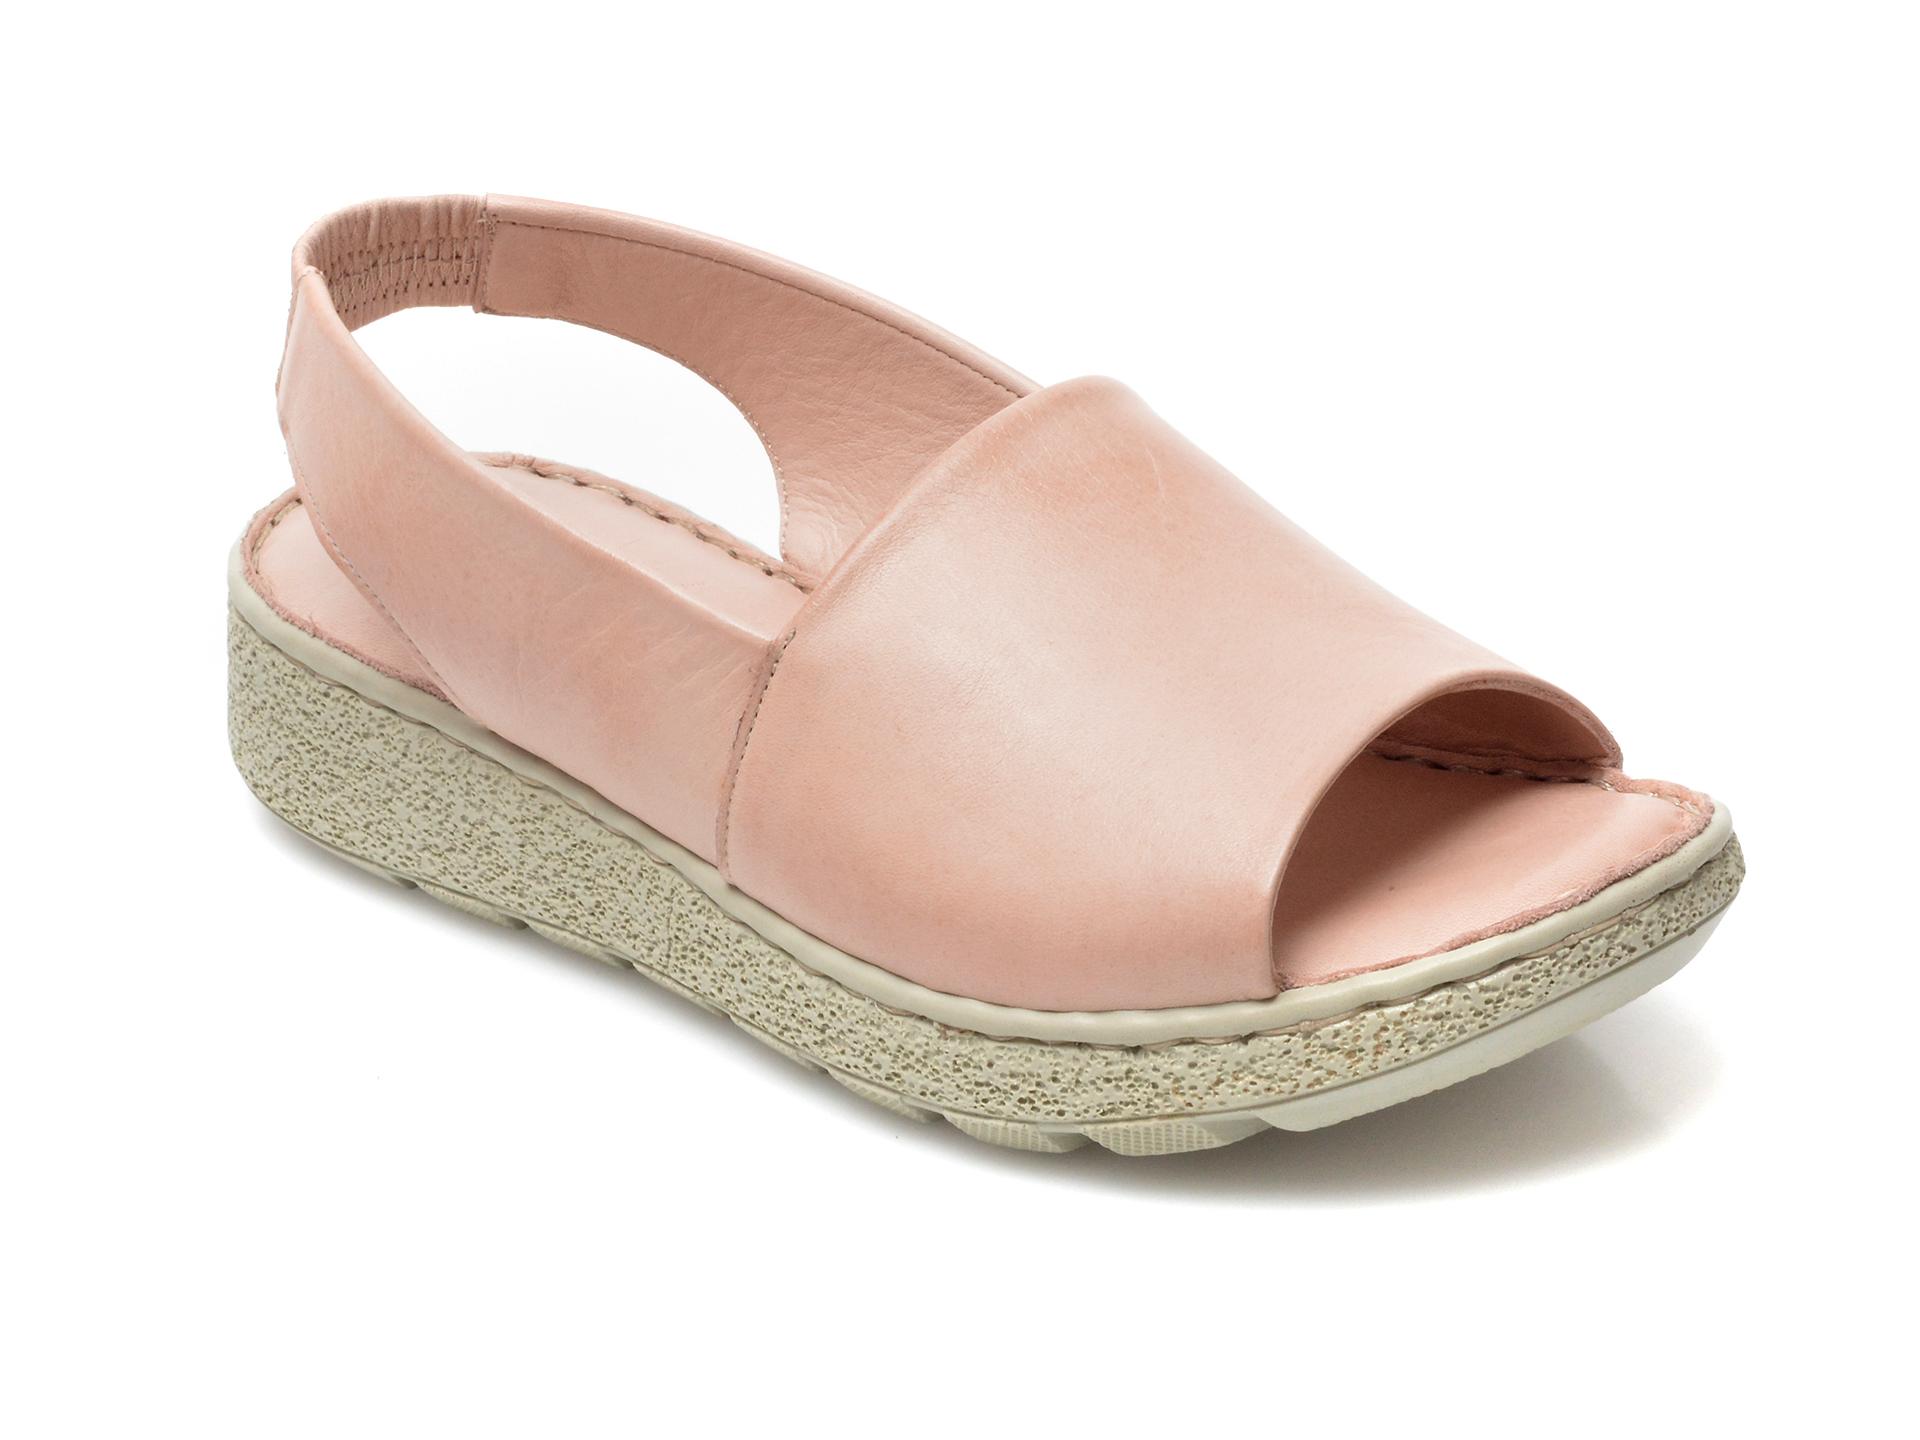 Sandale FLAVIA PASSINI nude, 2706, din piele naturala